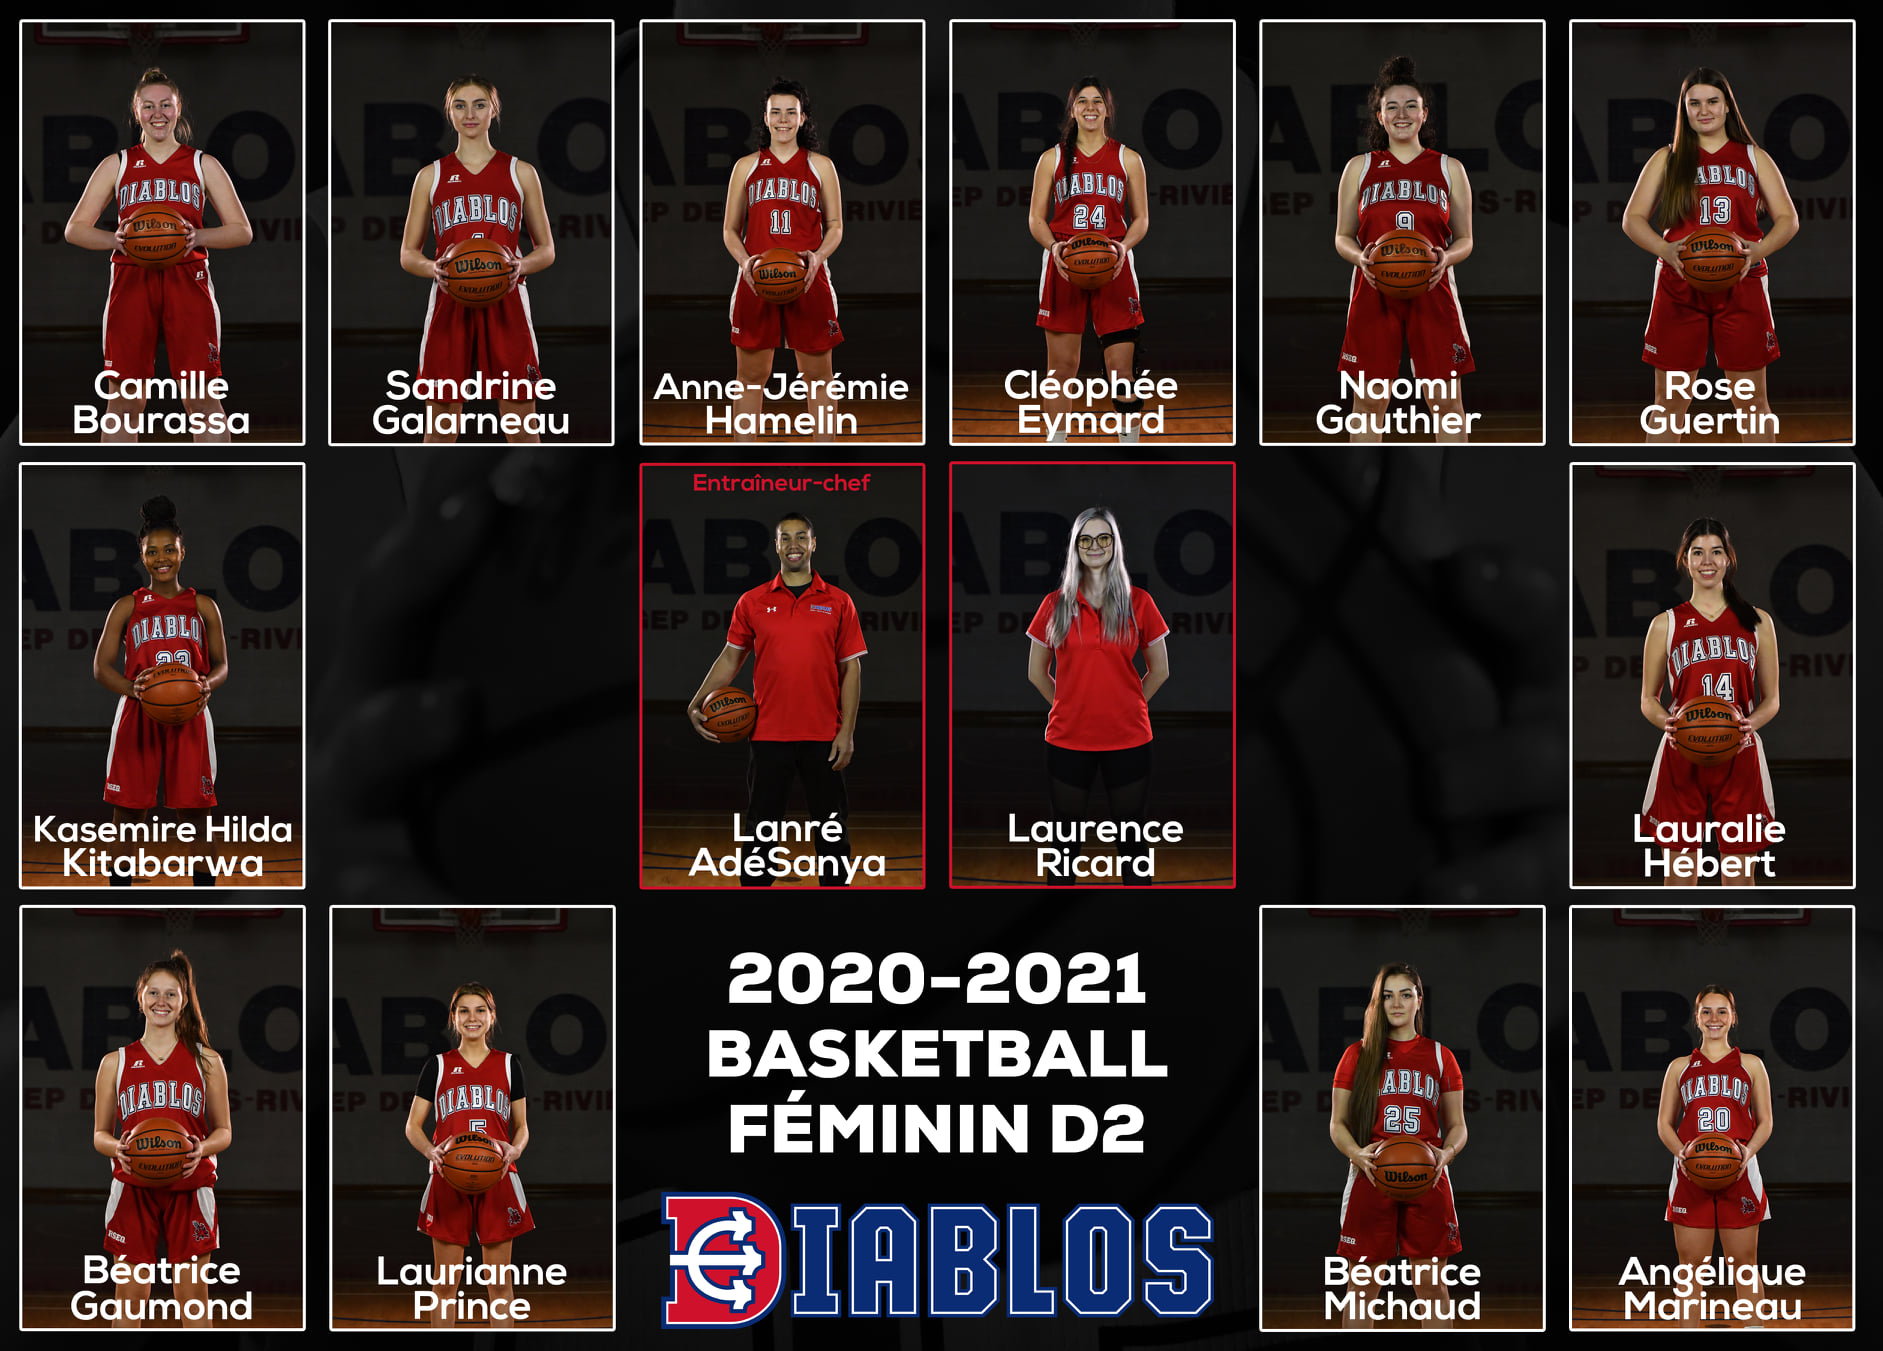 Équipe Diablos basketball féminin D2